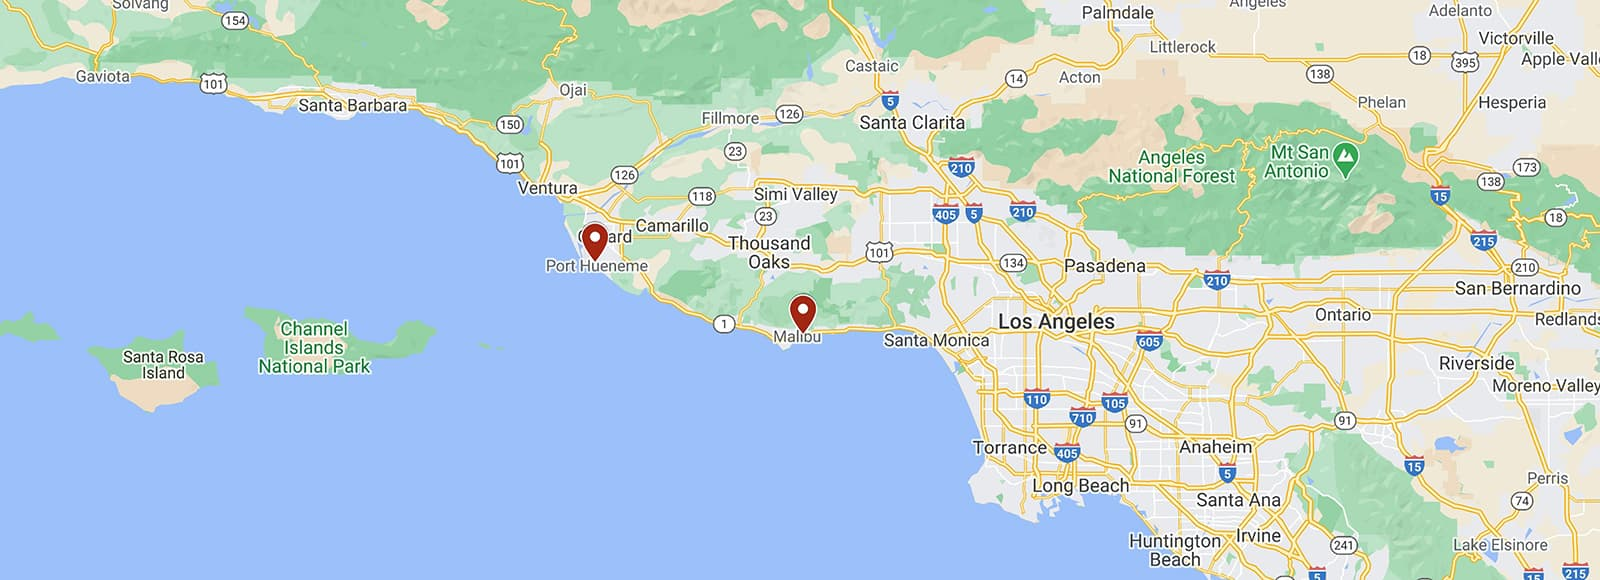 Passages Addiction Treatment Facility Locations